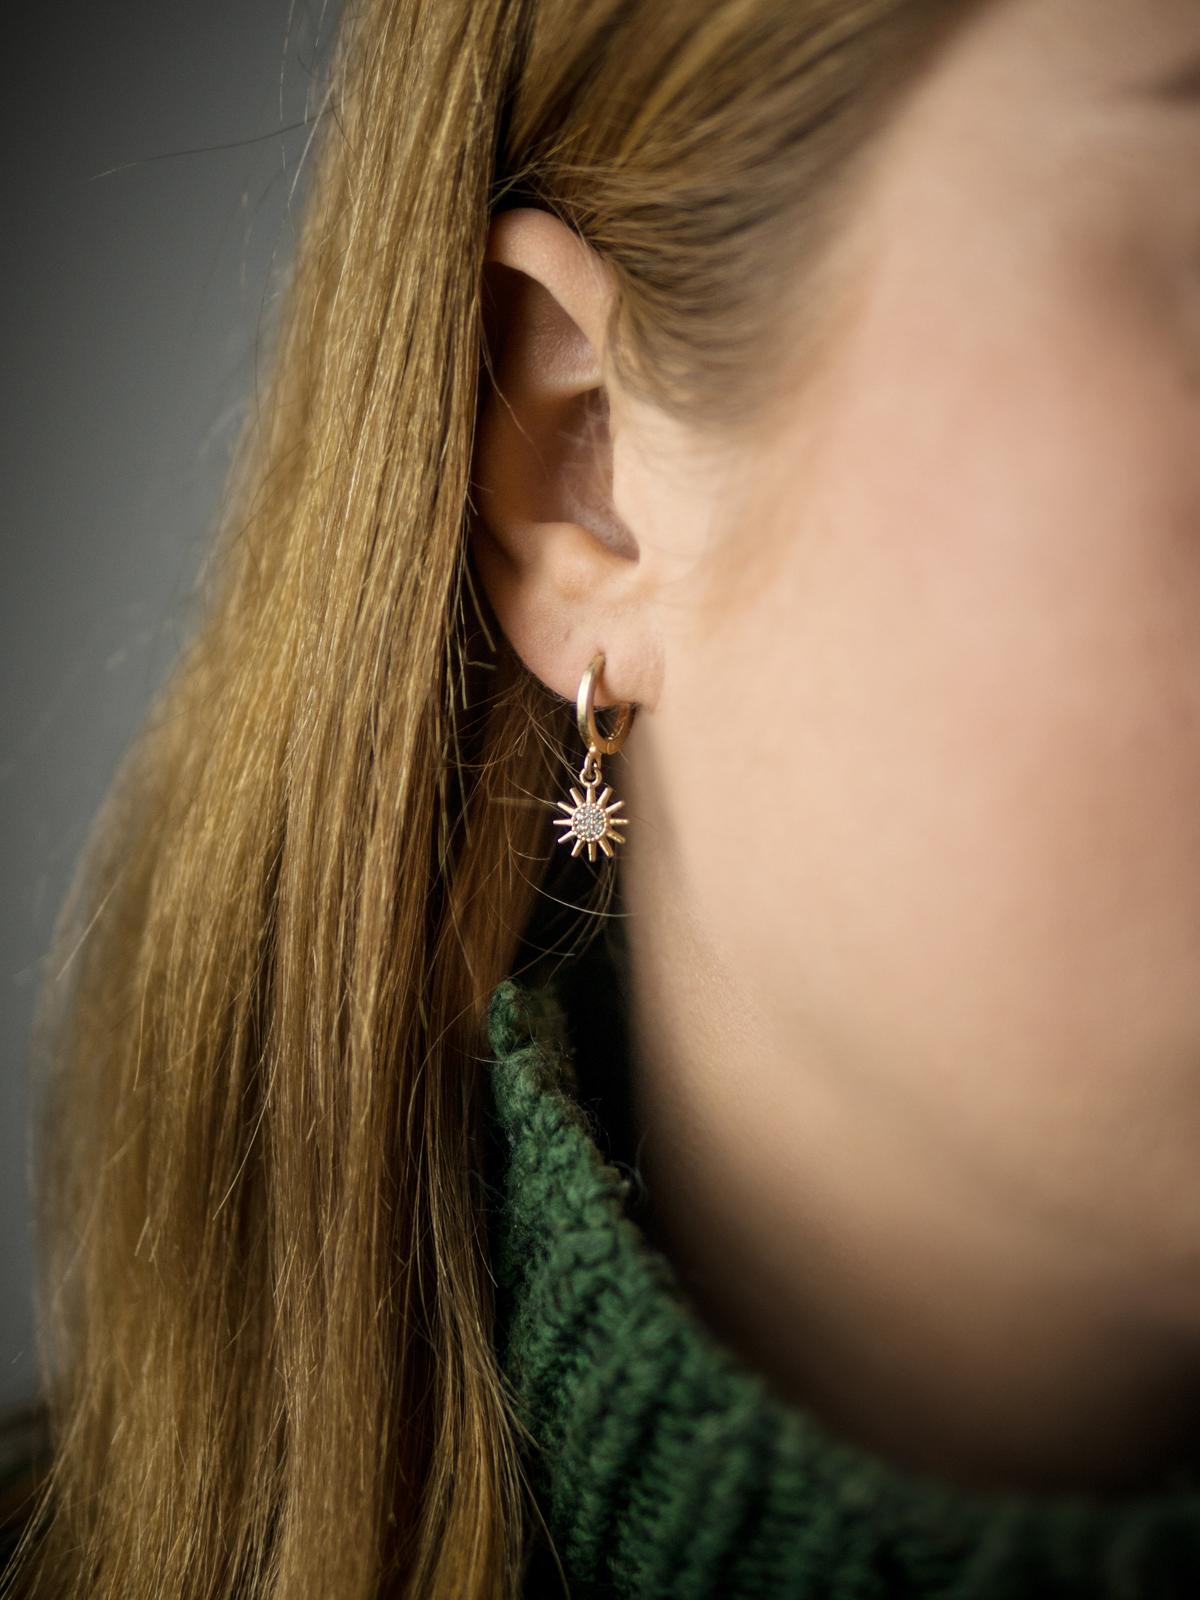 Ohrringe, Ear Candy, Tolle Schmuckstücke, Ohrringe, Ear Candy Party, Creolen, Hoops, Ohrring Trends